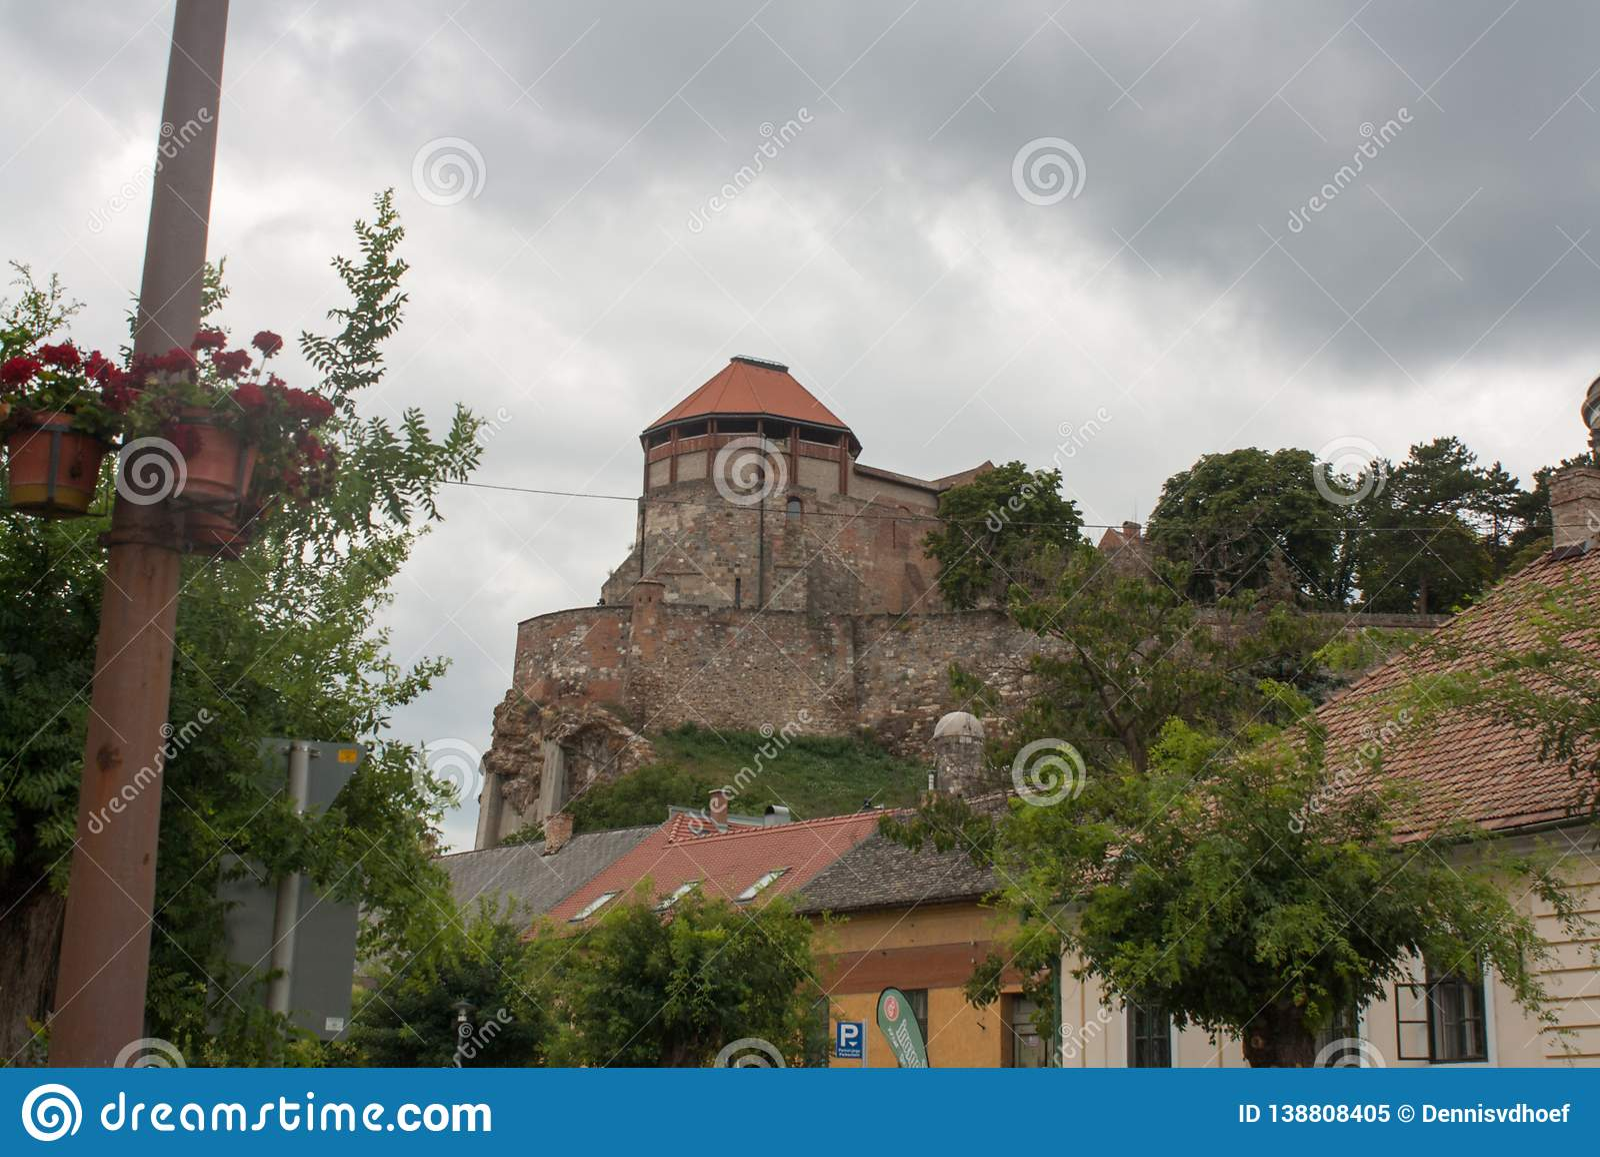 Esztergom Castle Museum of the Hungarian National Museum.